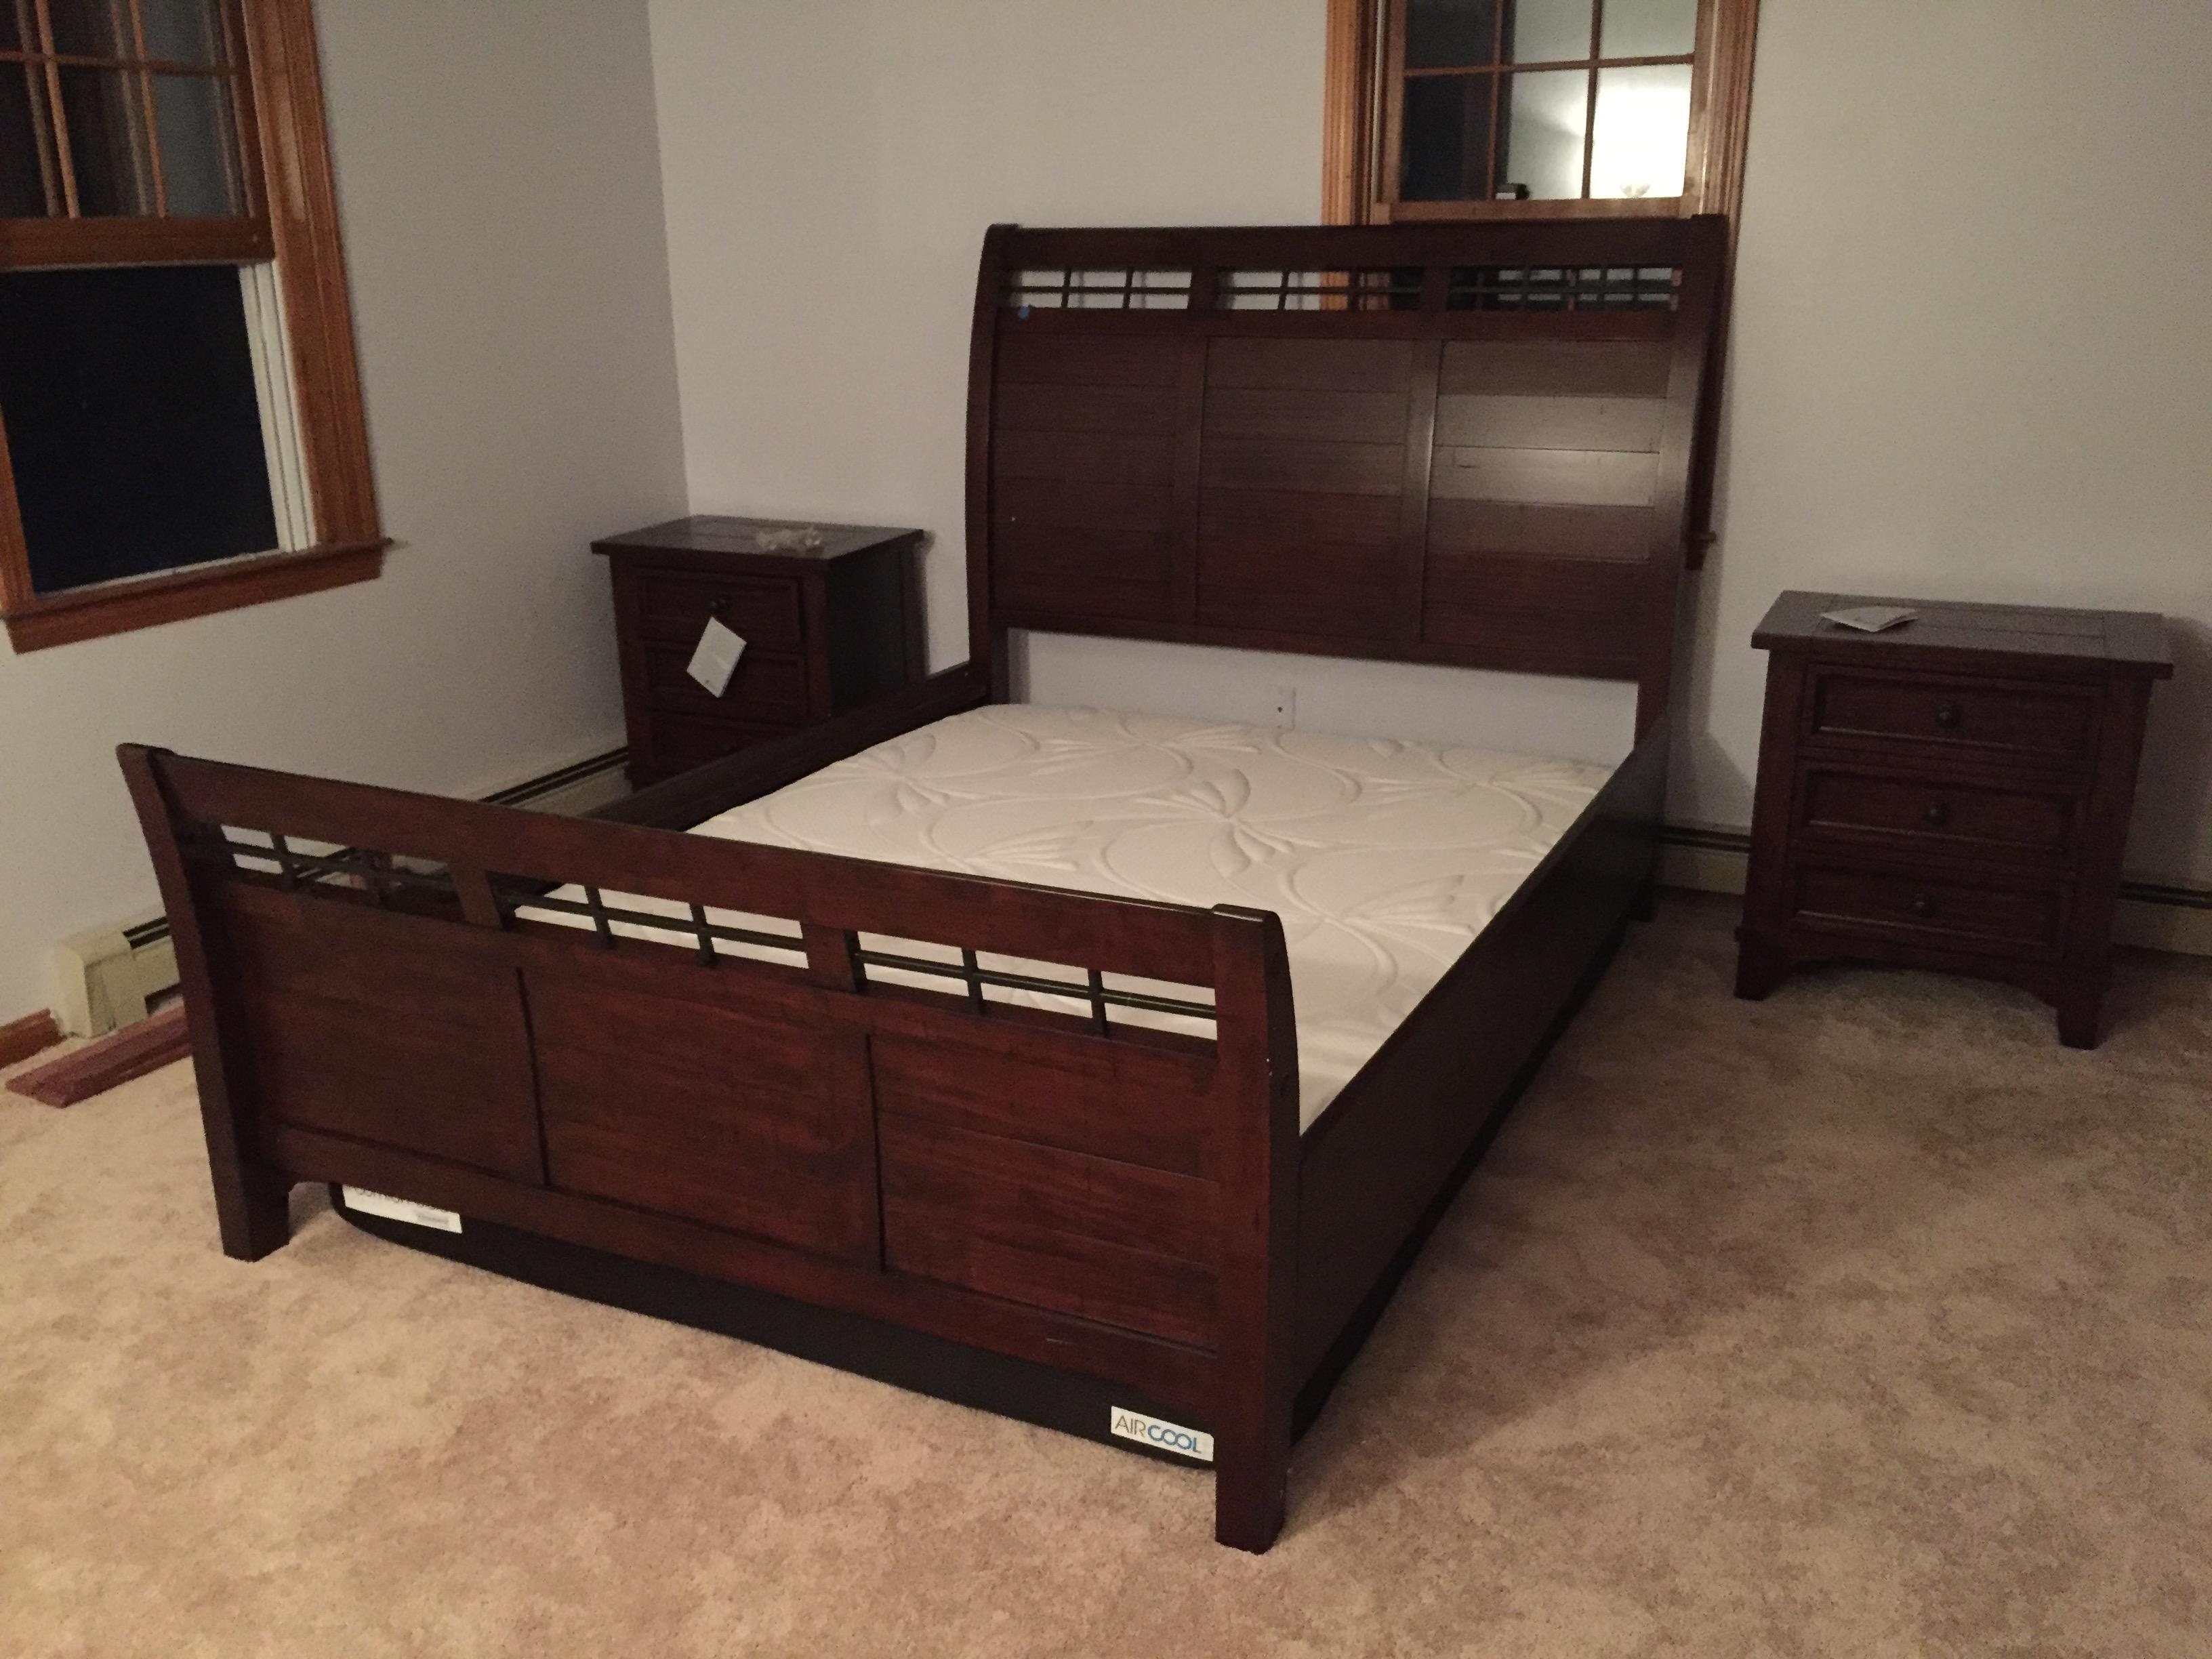 Ashbrook Furniture 11 Daniel Webster Hwy, Nashua, NH 11 - YP.com